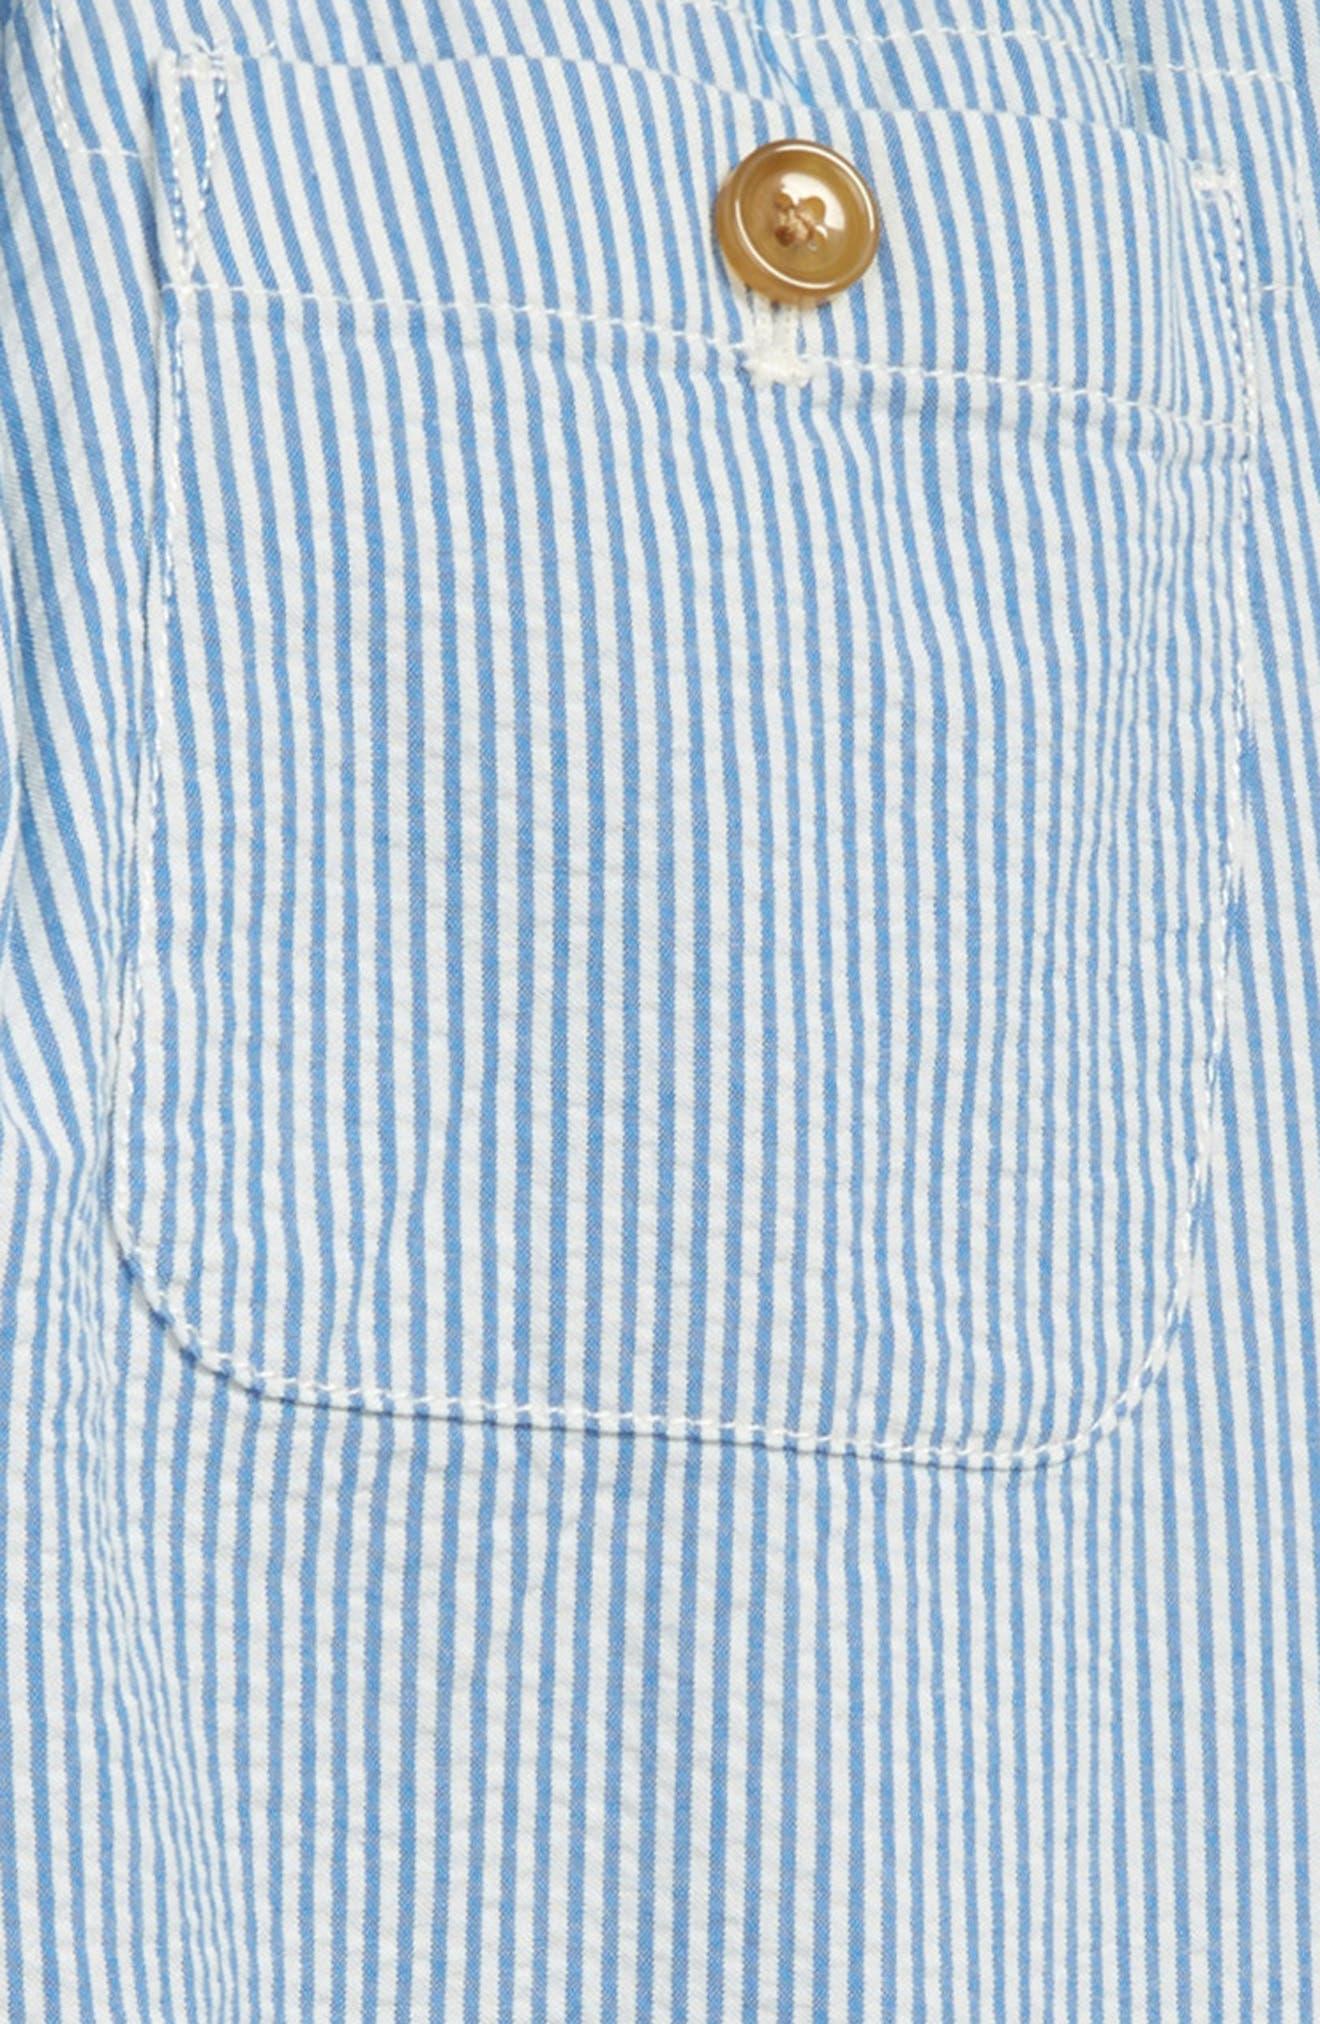 CREWCUTS BY J.CREW,                             Seersucker Pants,                             Alternate thumbnail 3, color,                             400